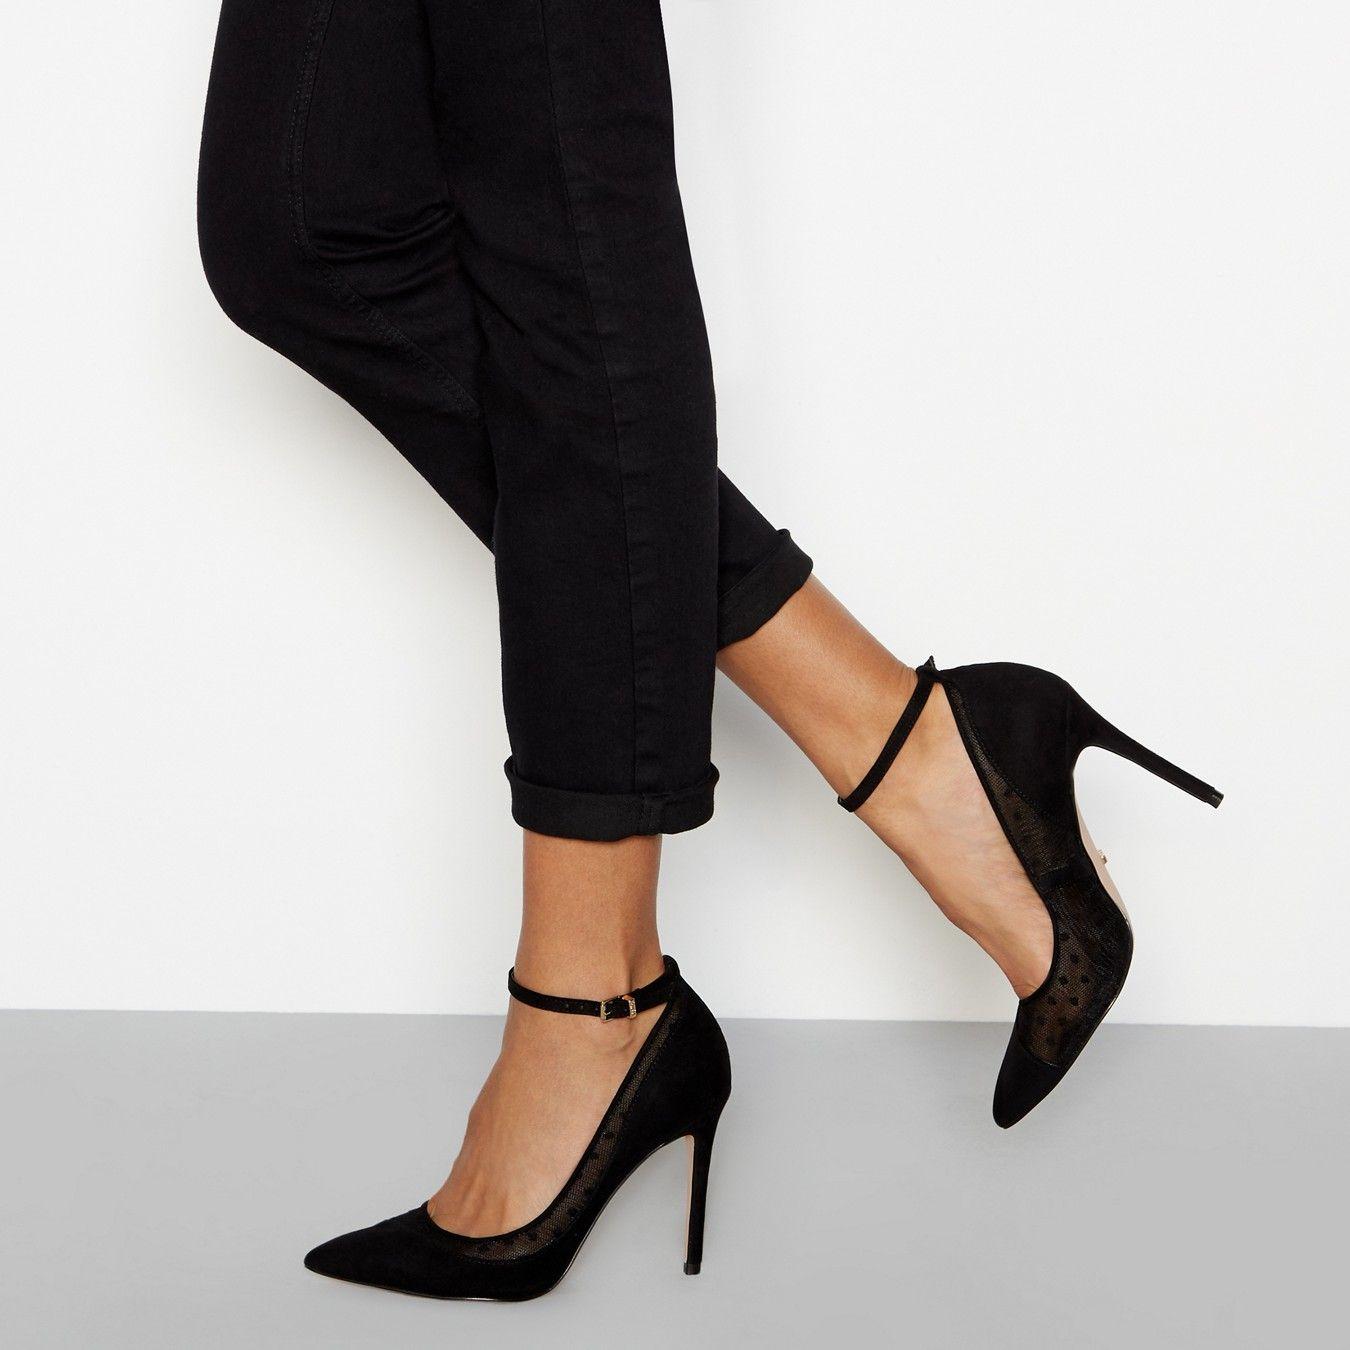 b181102884f Black polka dot mesh ankle strap high court shoes | Rachel | Court ...